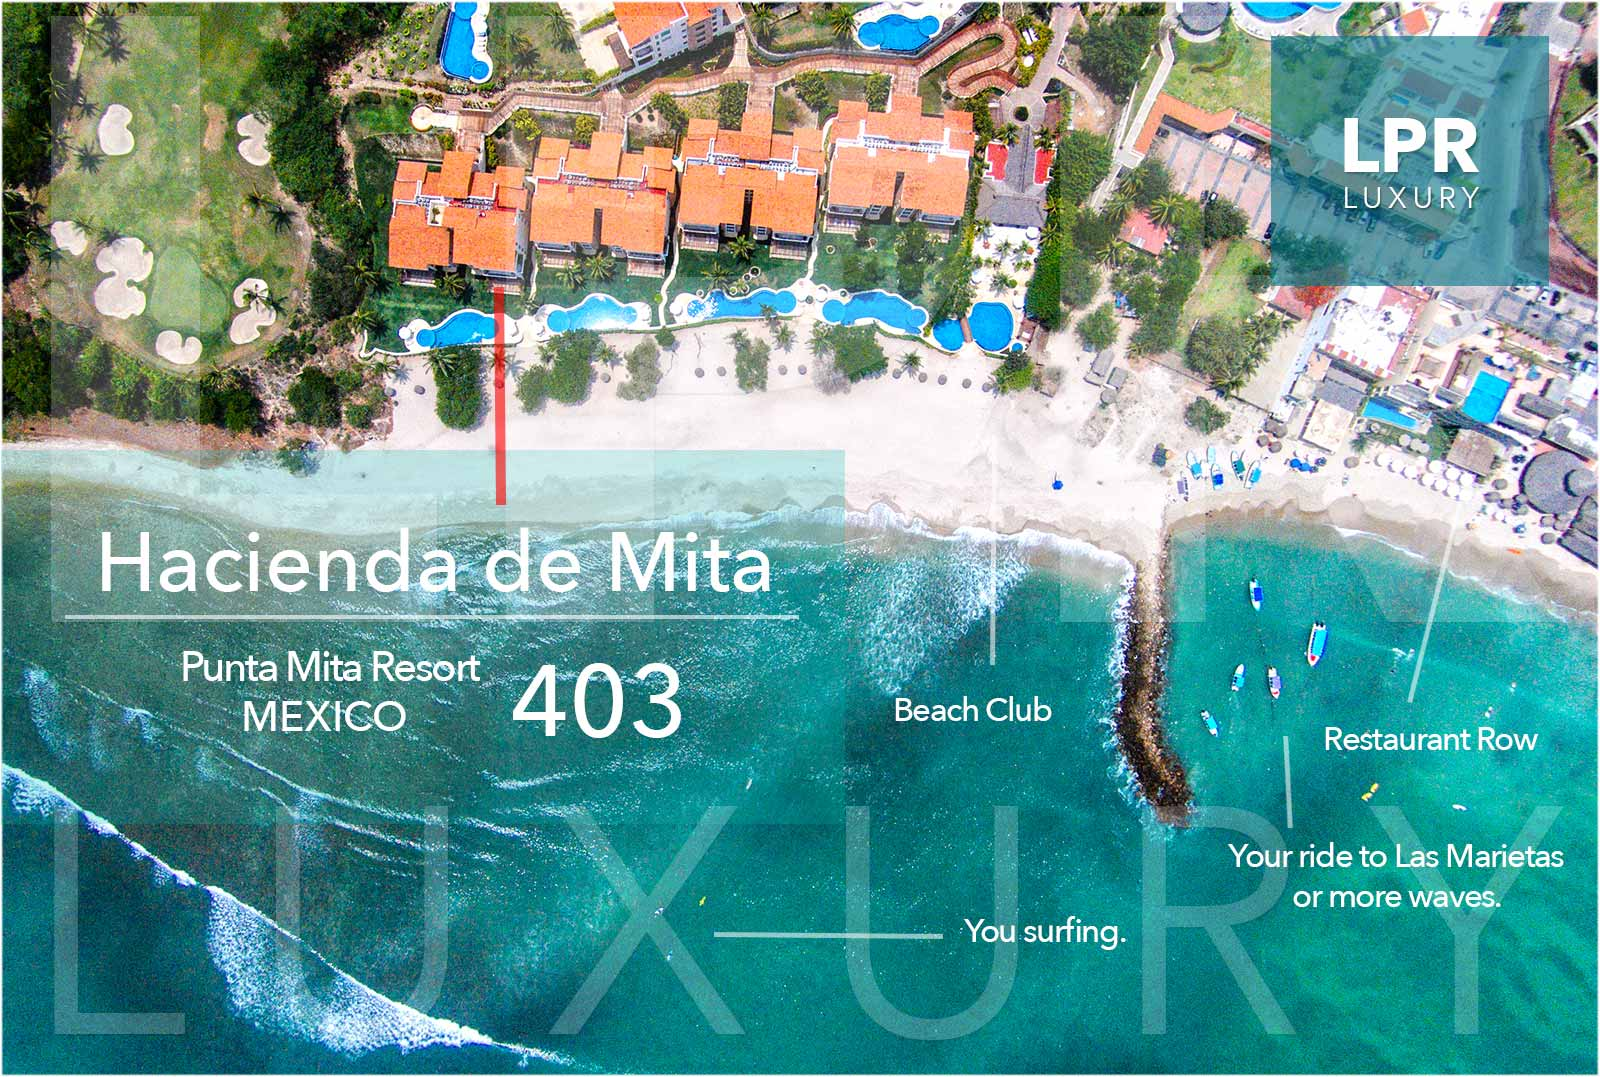 Hacienda de Mita 403 - Punta Mita Resort